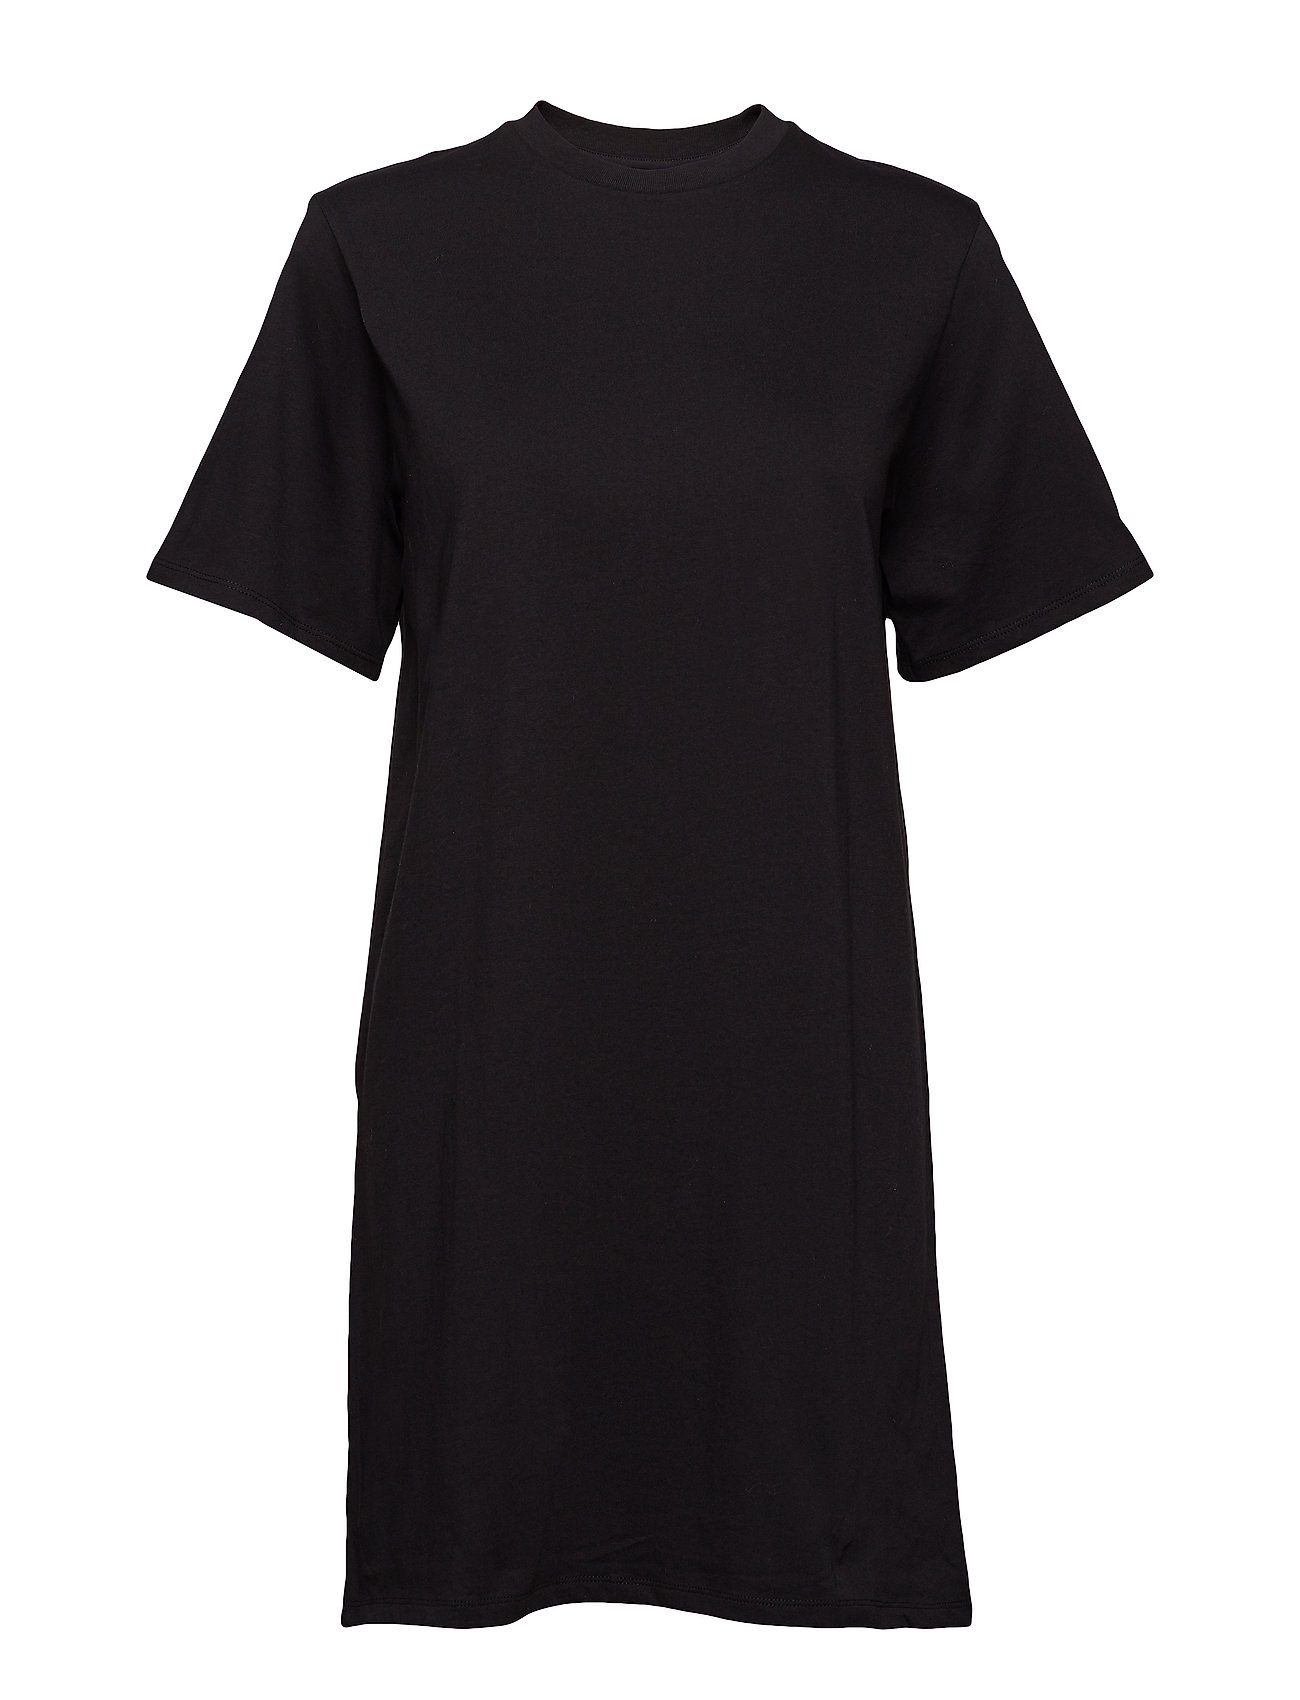 Image of Ivy Tshirt Dress (3118686493)